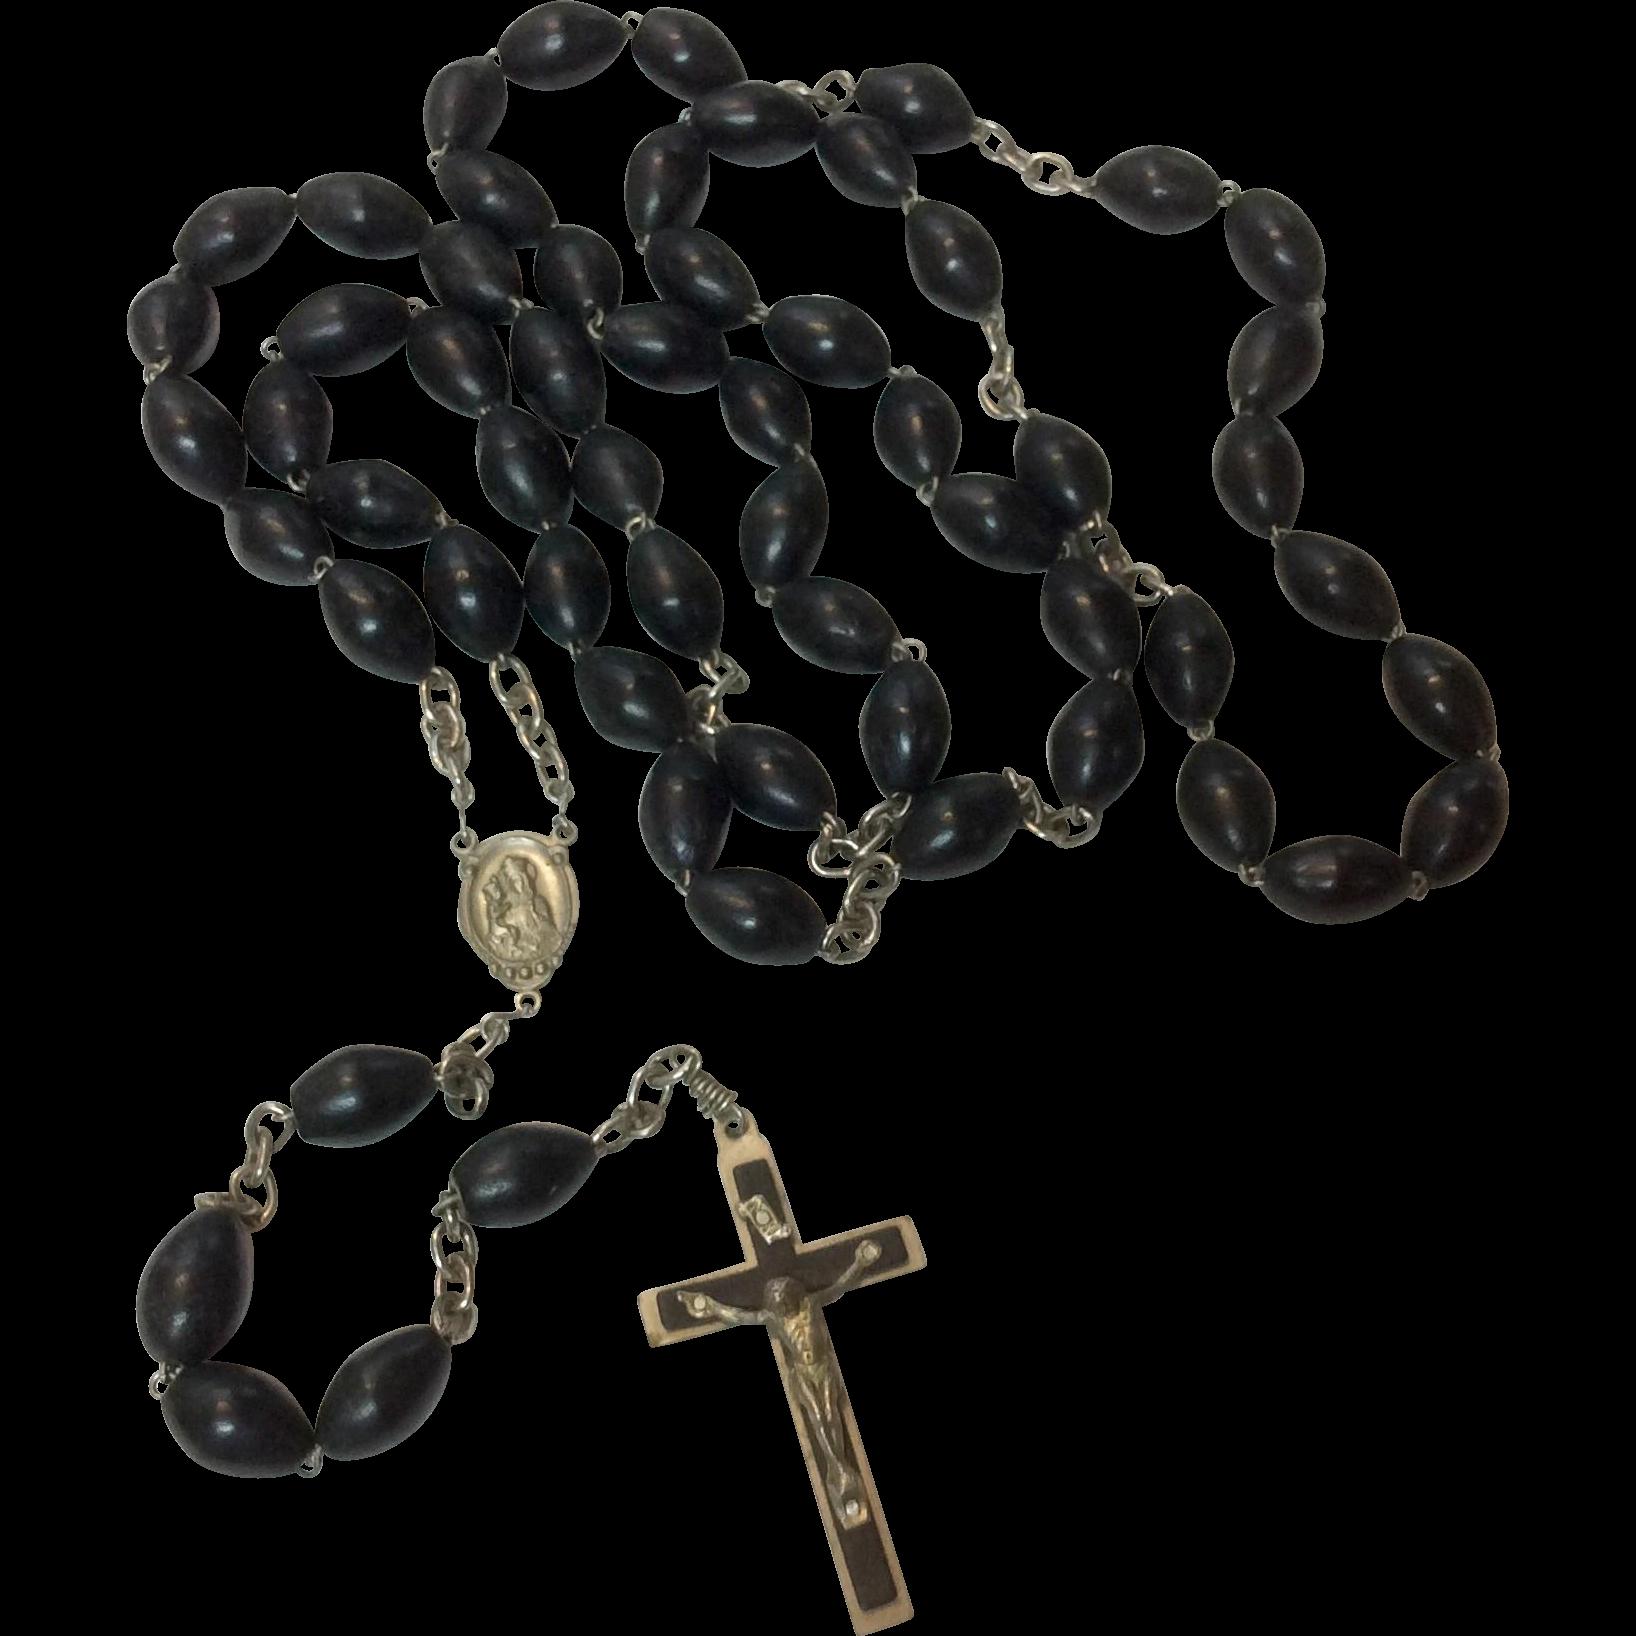 Early Large French Wooden Bead Catholic Rosary